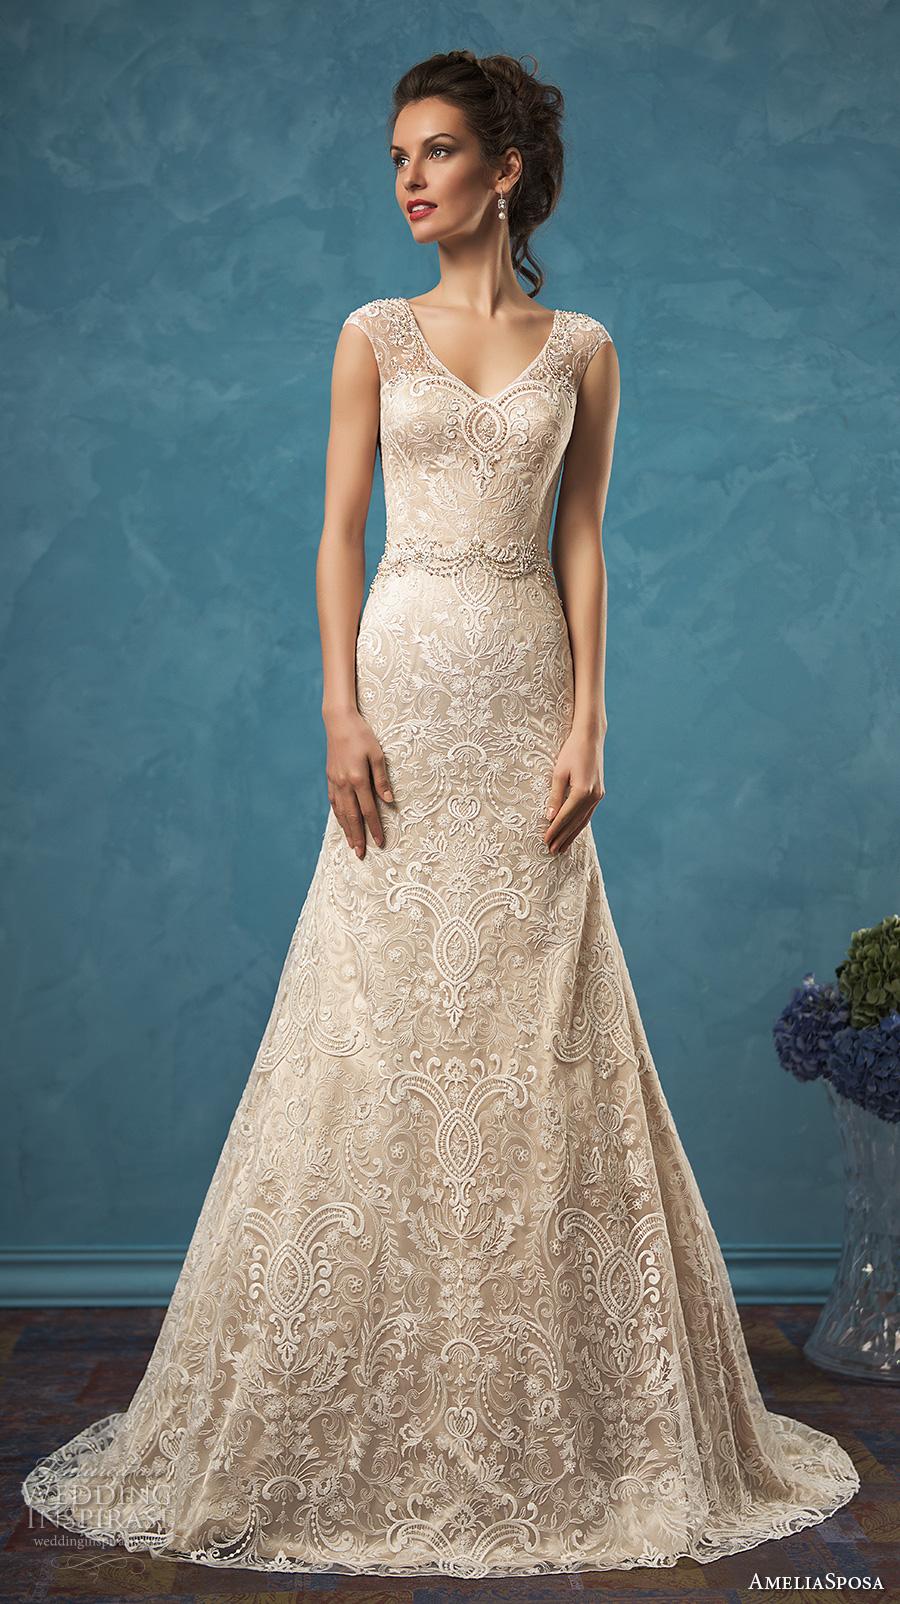 Wedding Dress Design Competition 2017 - Junoir Bridesmaid Dresses